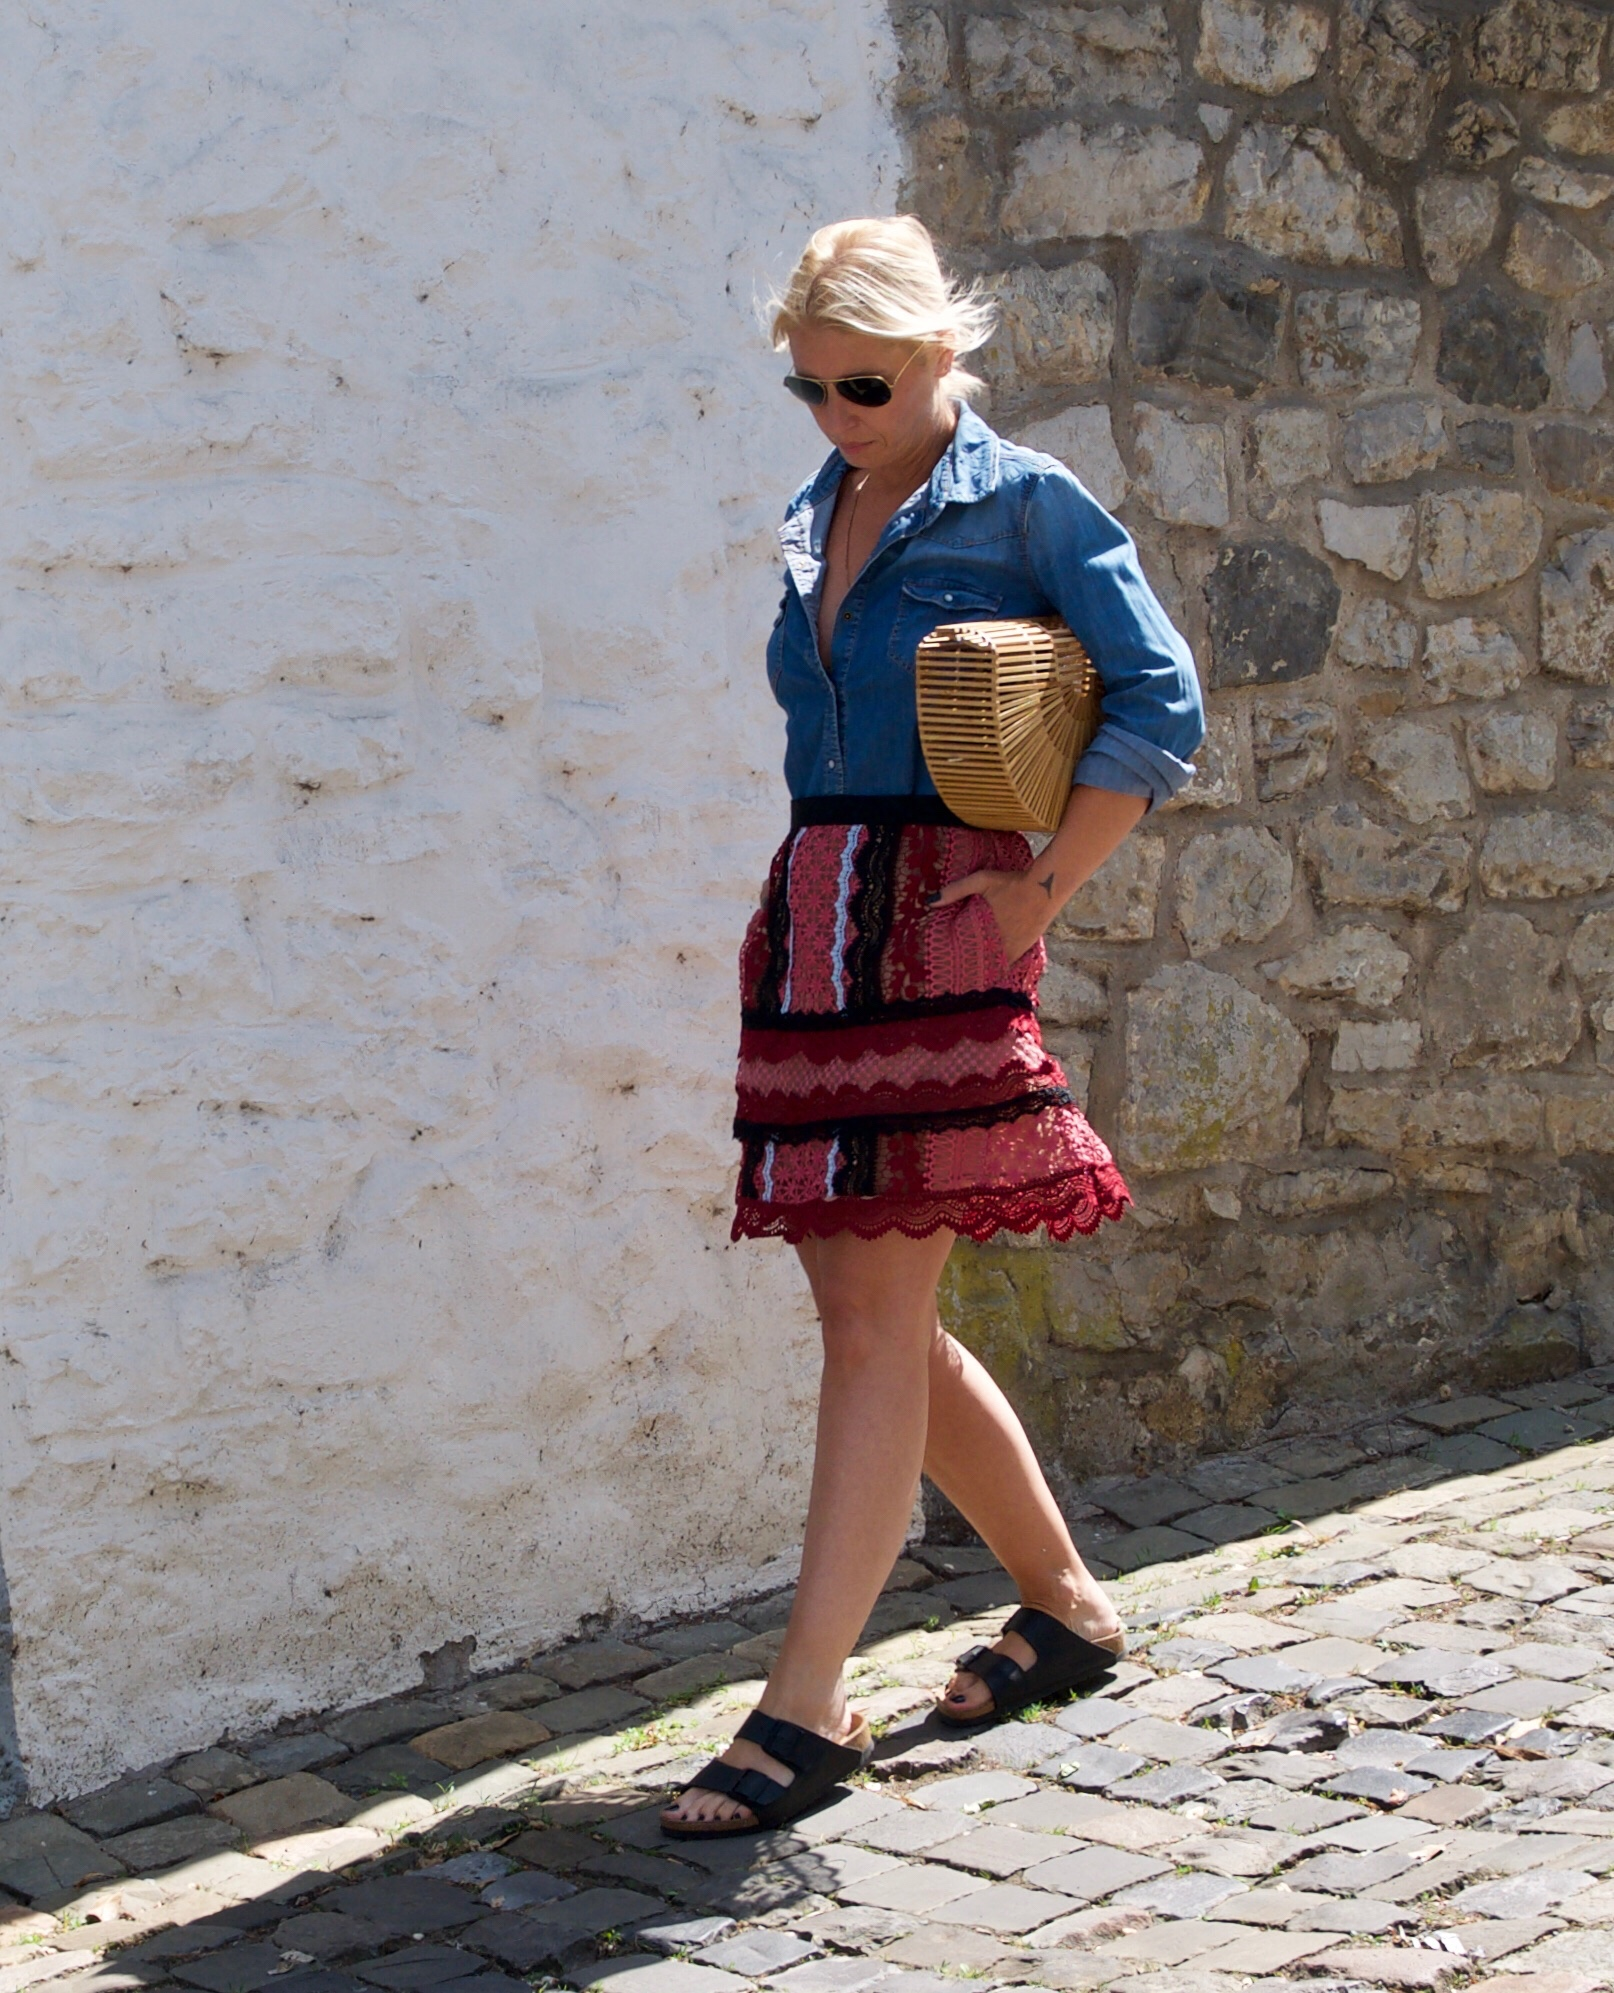 Self-Portrait skirt with Bamboo Bag - claudinesroom